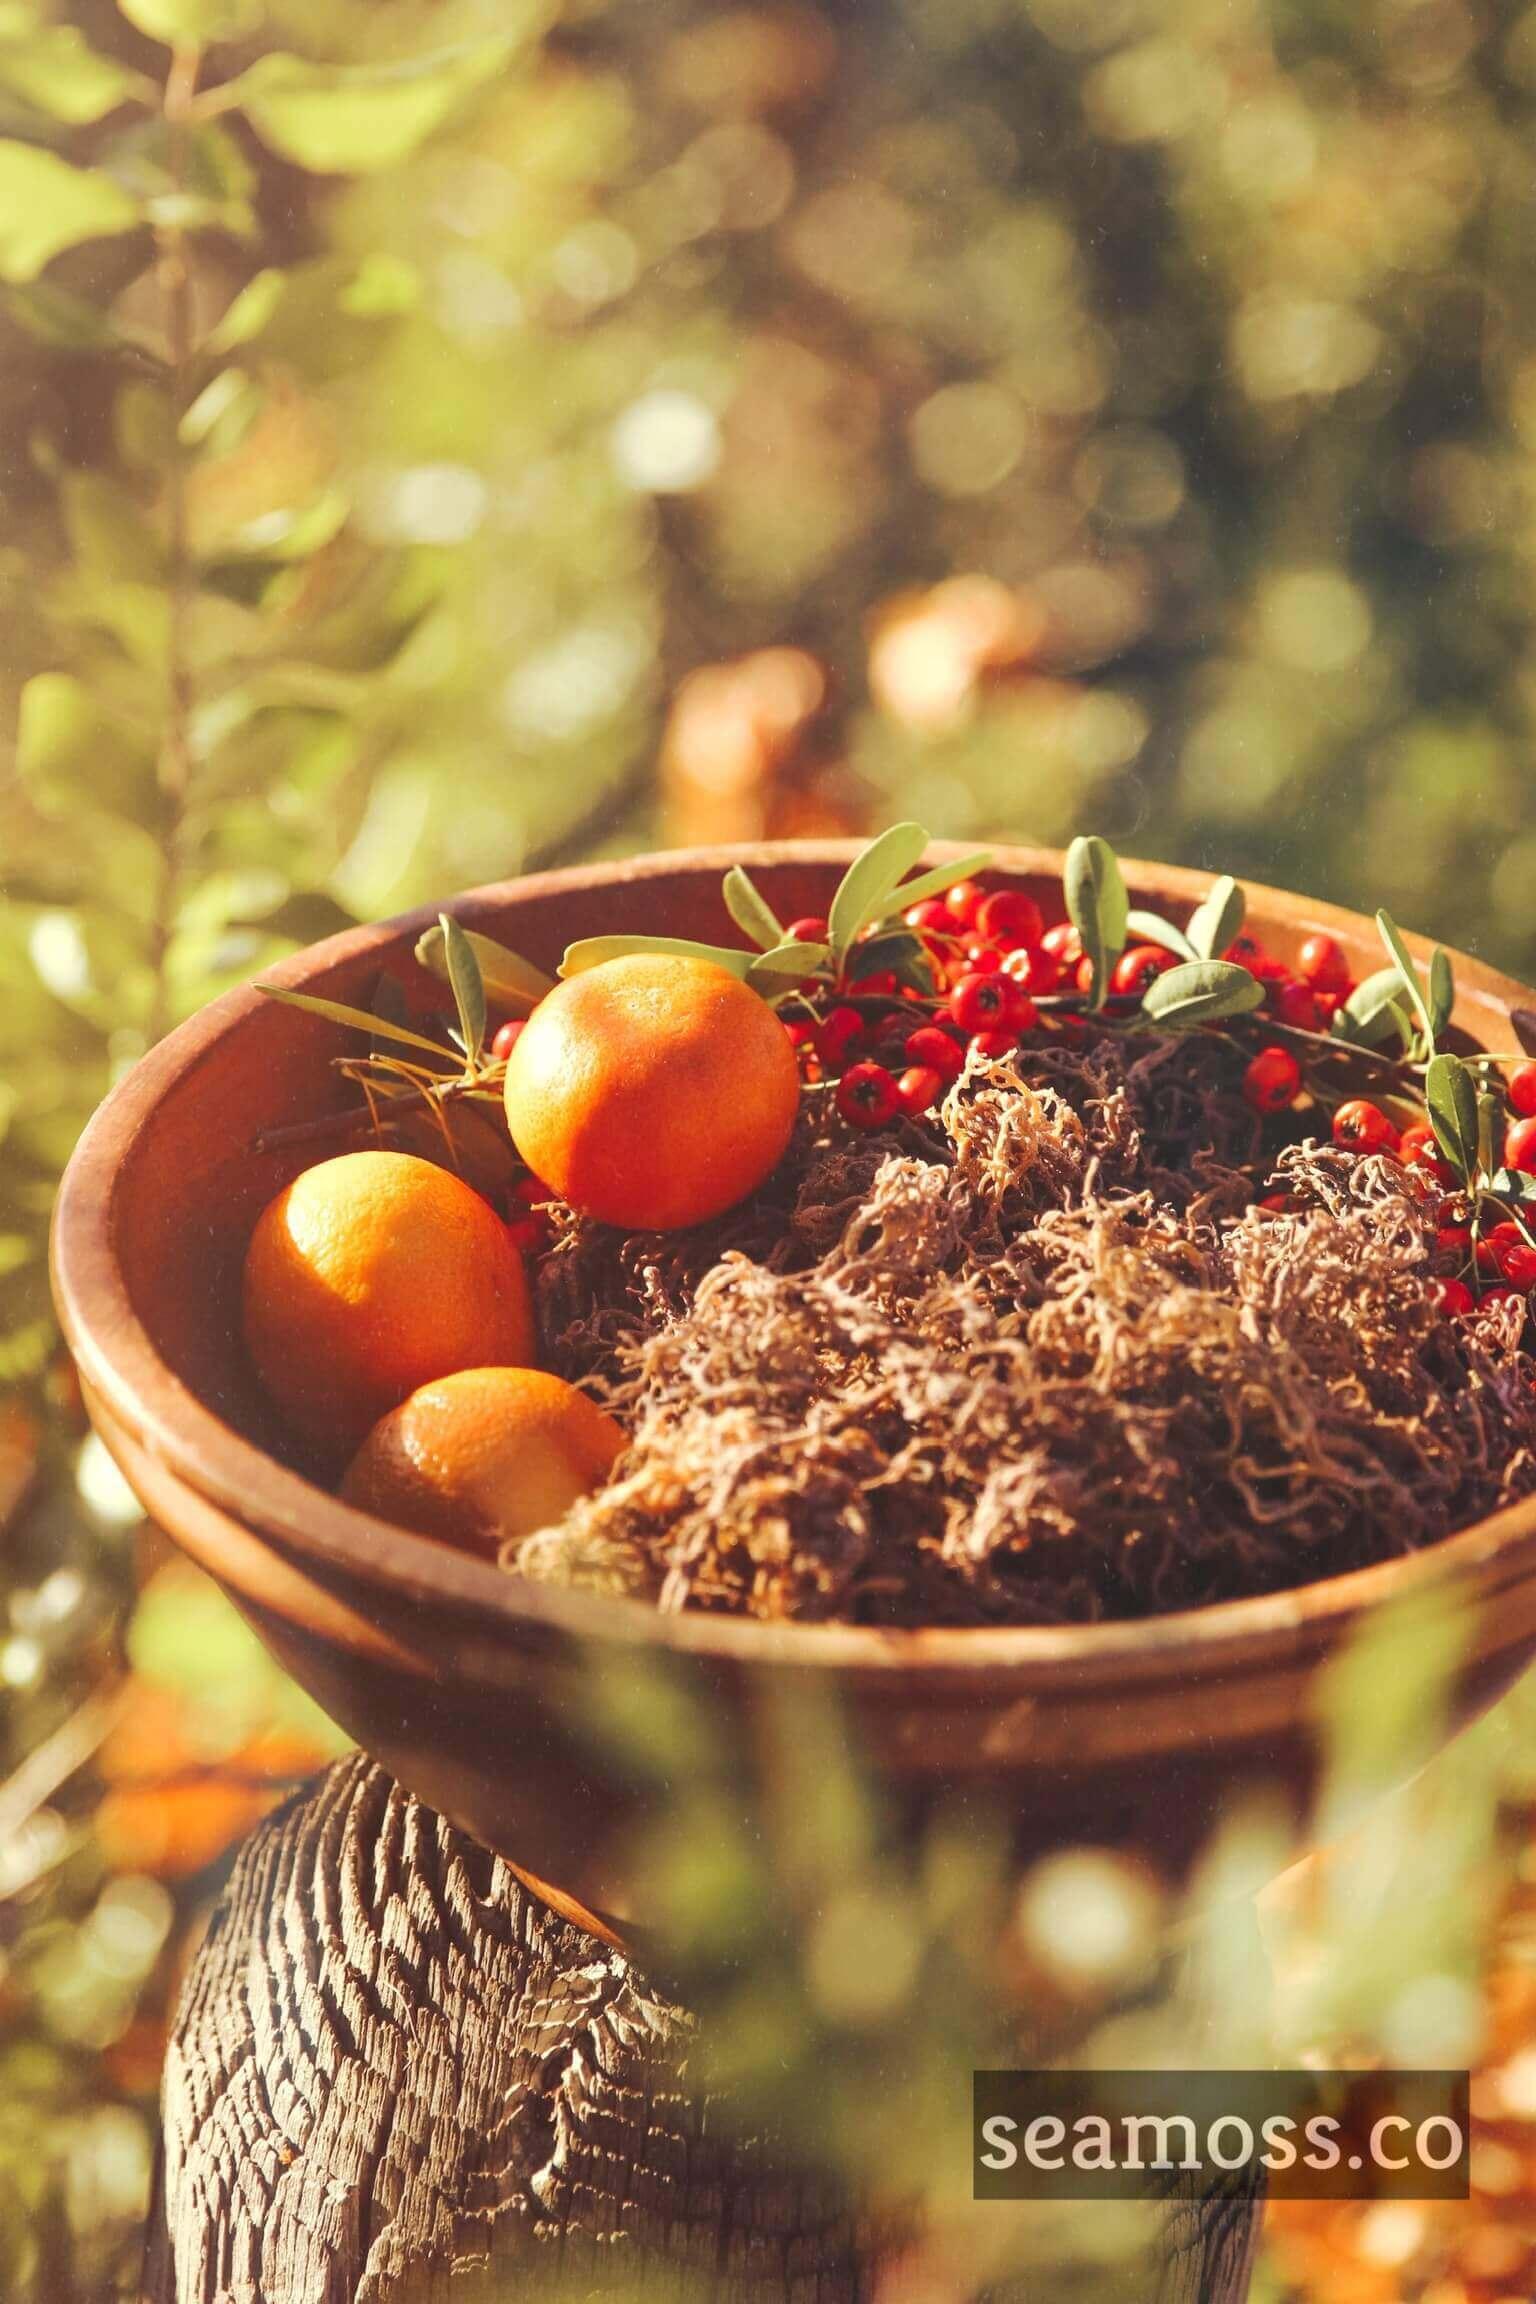 Fruit bowl with sea moss on tree stump